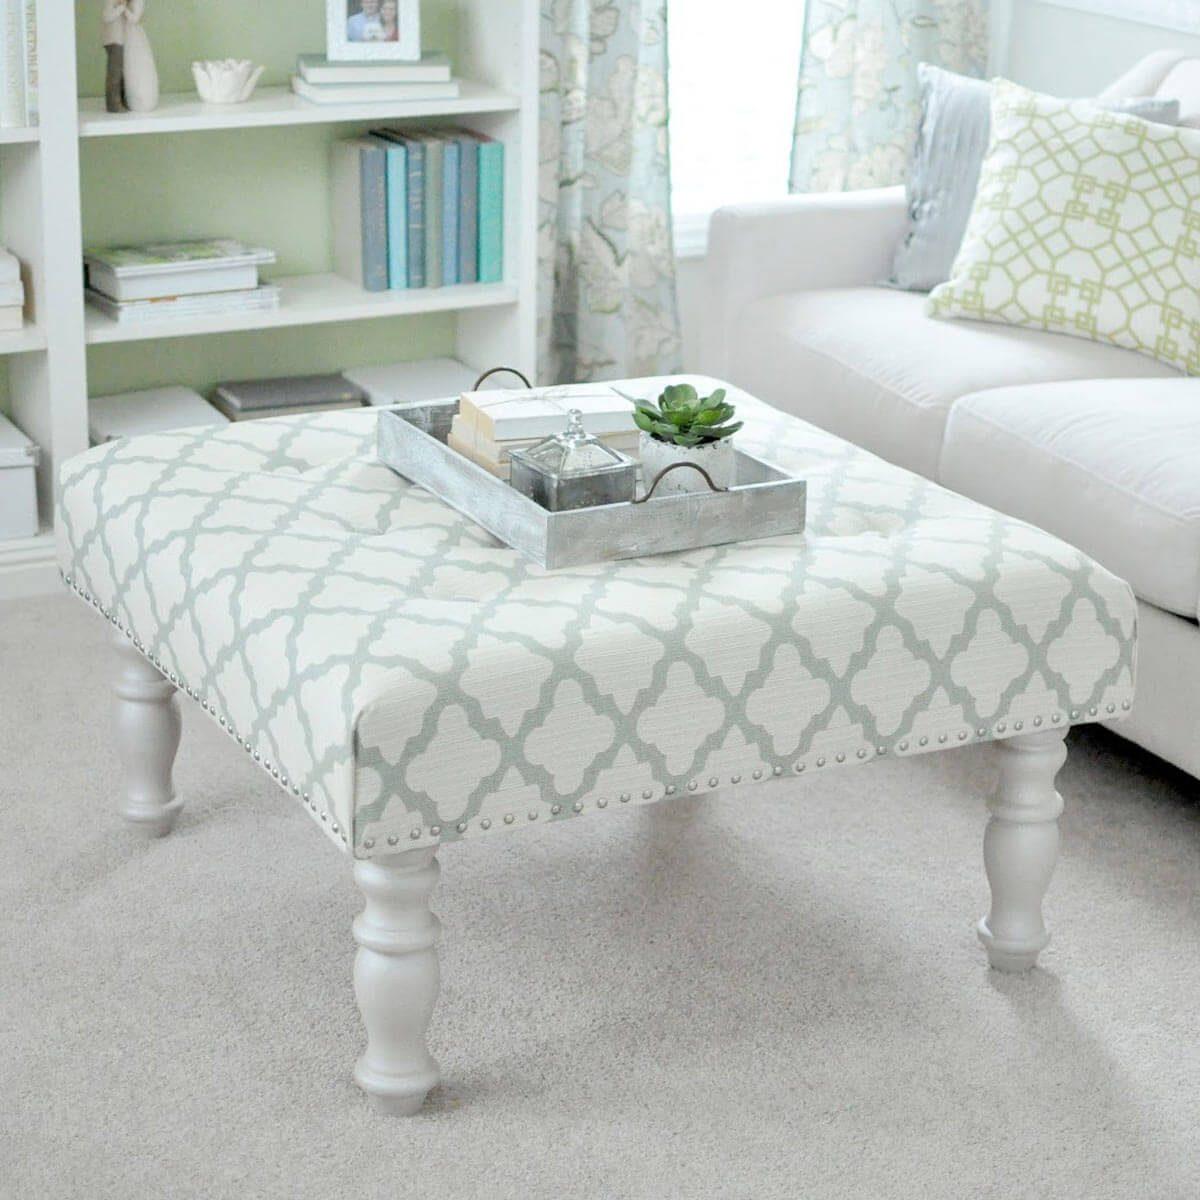 14 super cool homemade coffee table ideas the family handyman ottomancoffee table hybrid solutioingenieria Images